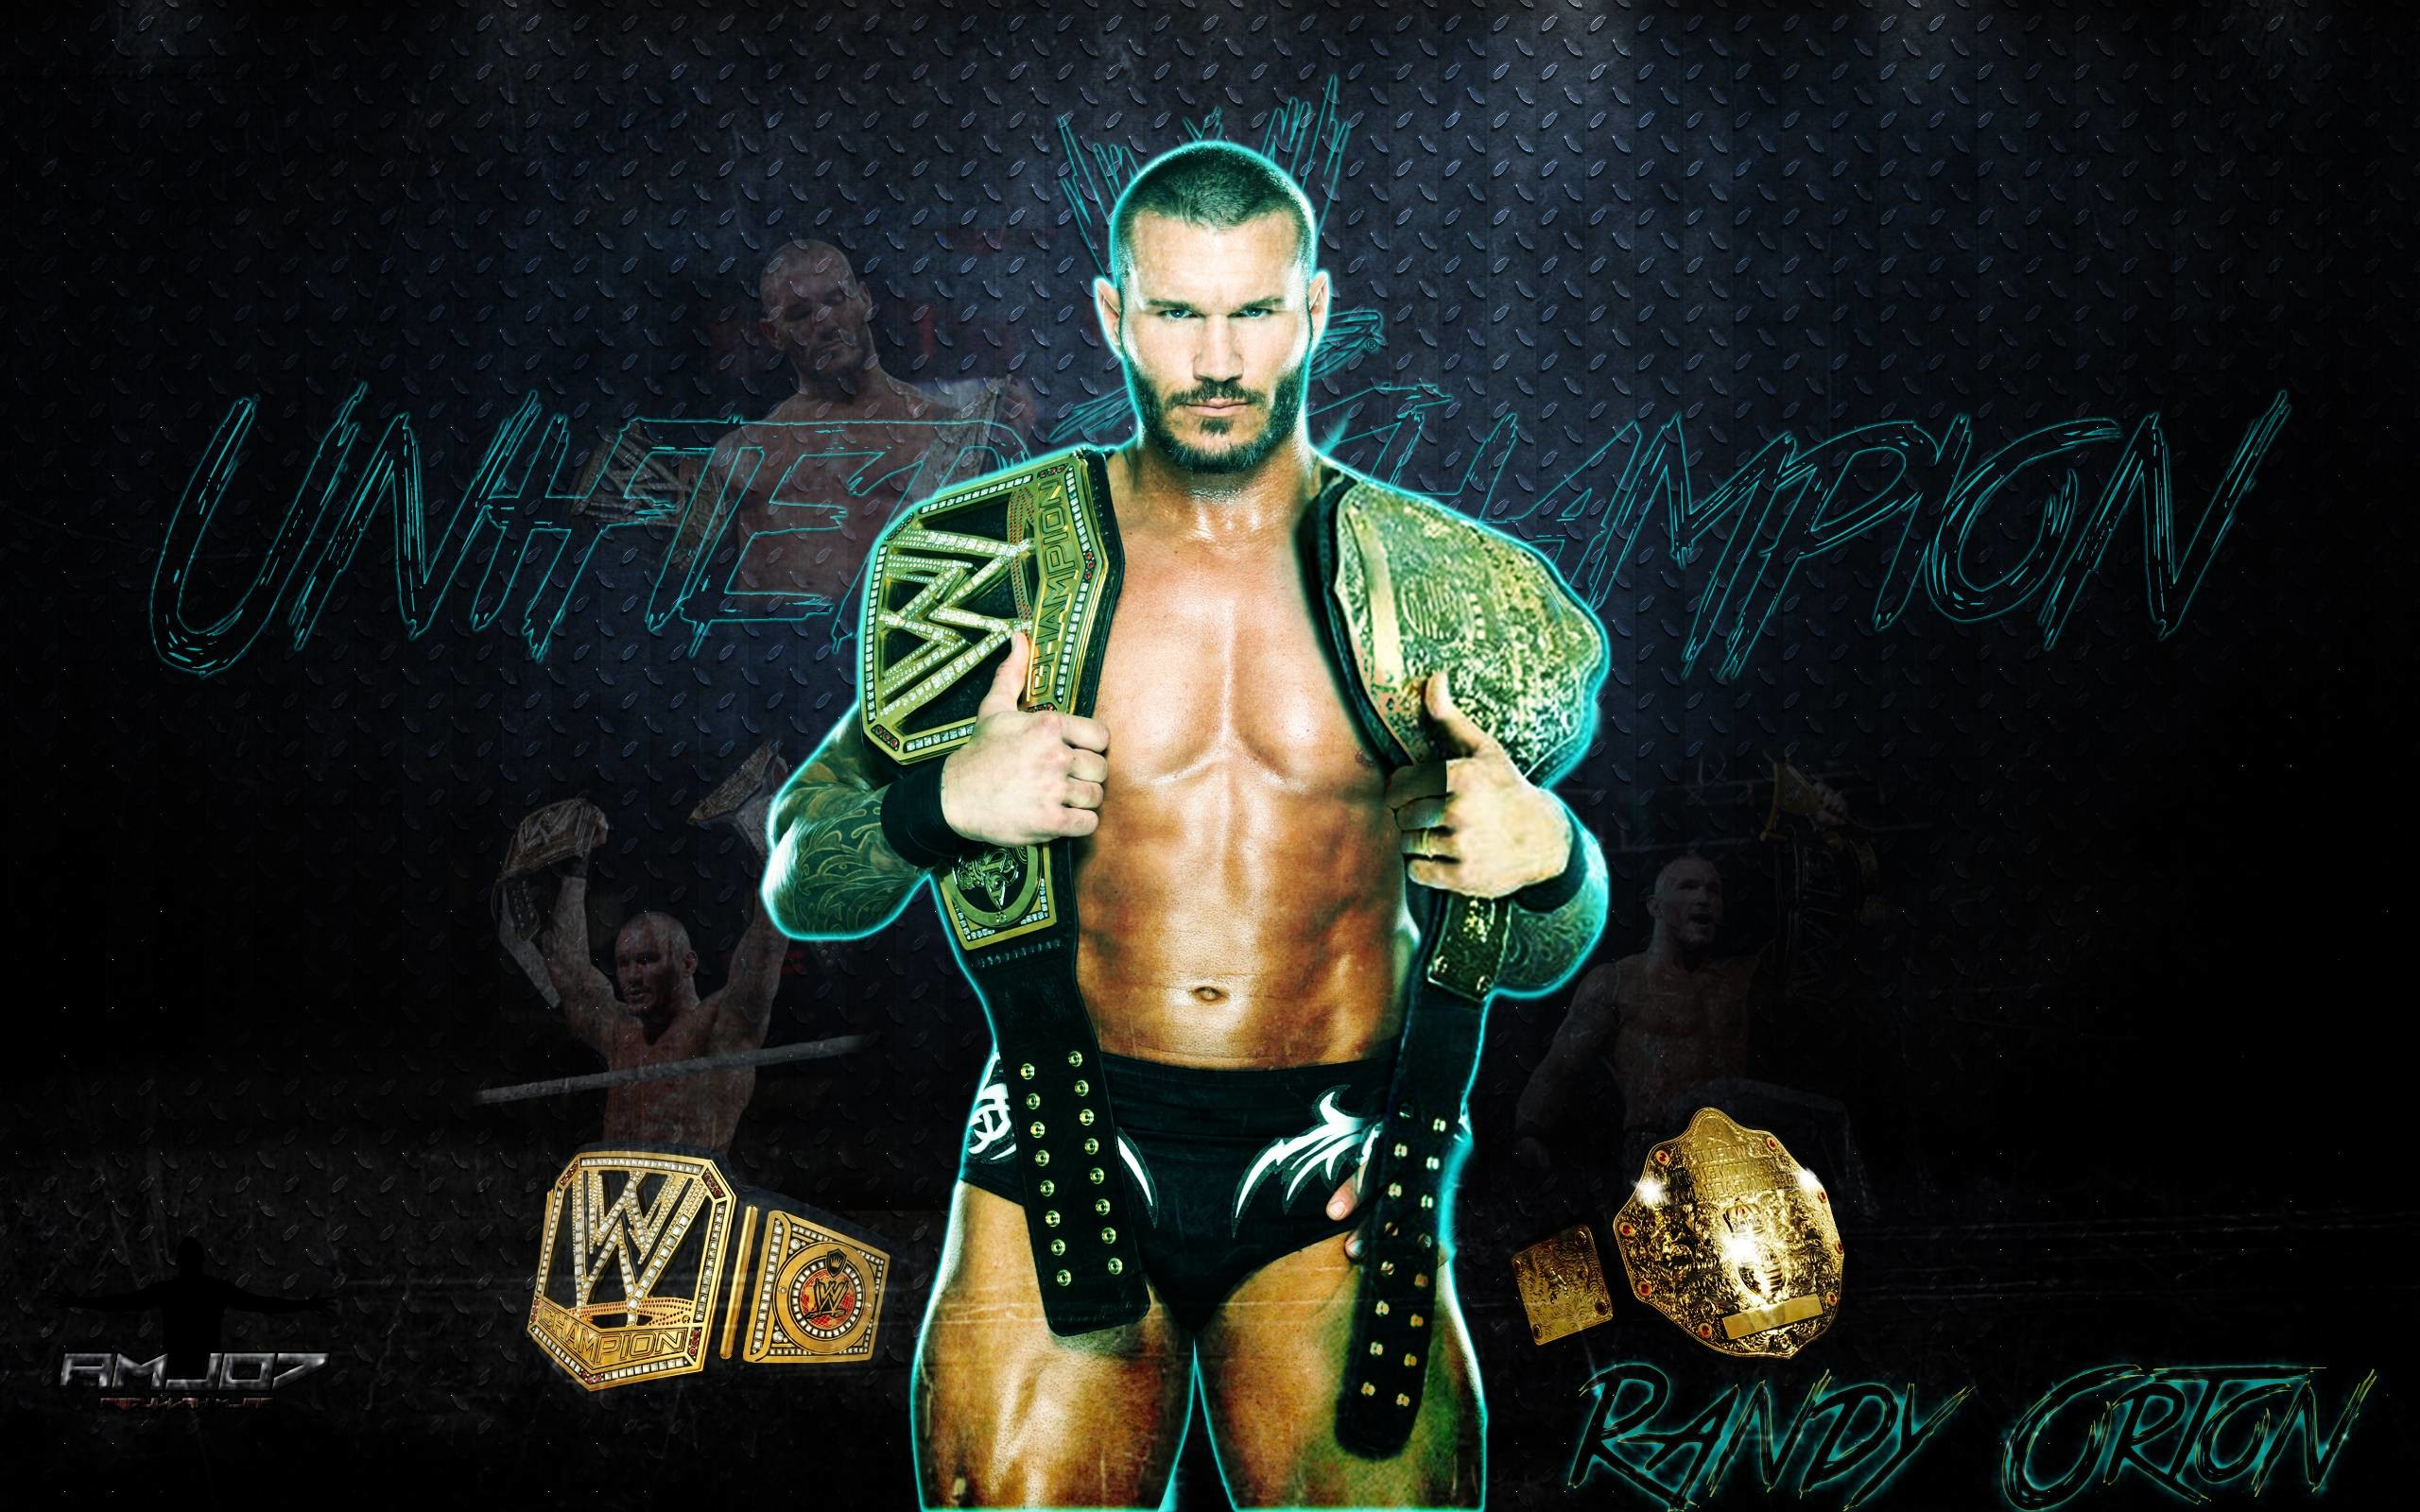 Randy Orton Hd Wallpapers   Wallpapers Top 10